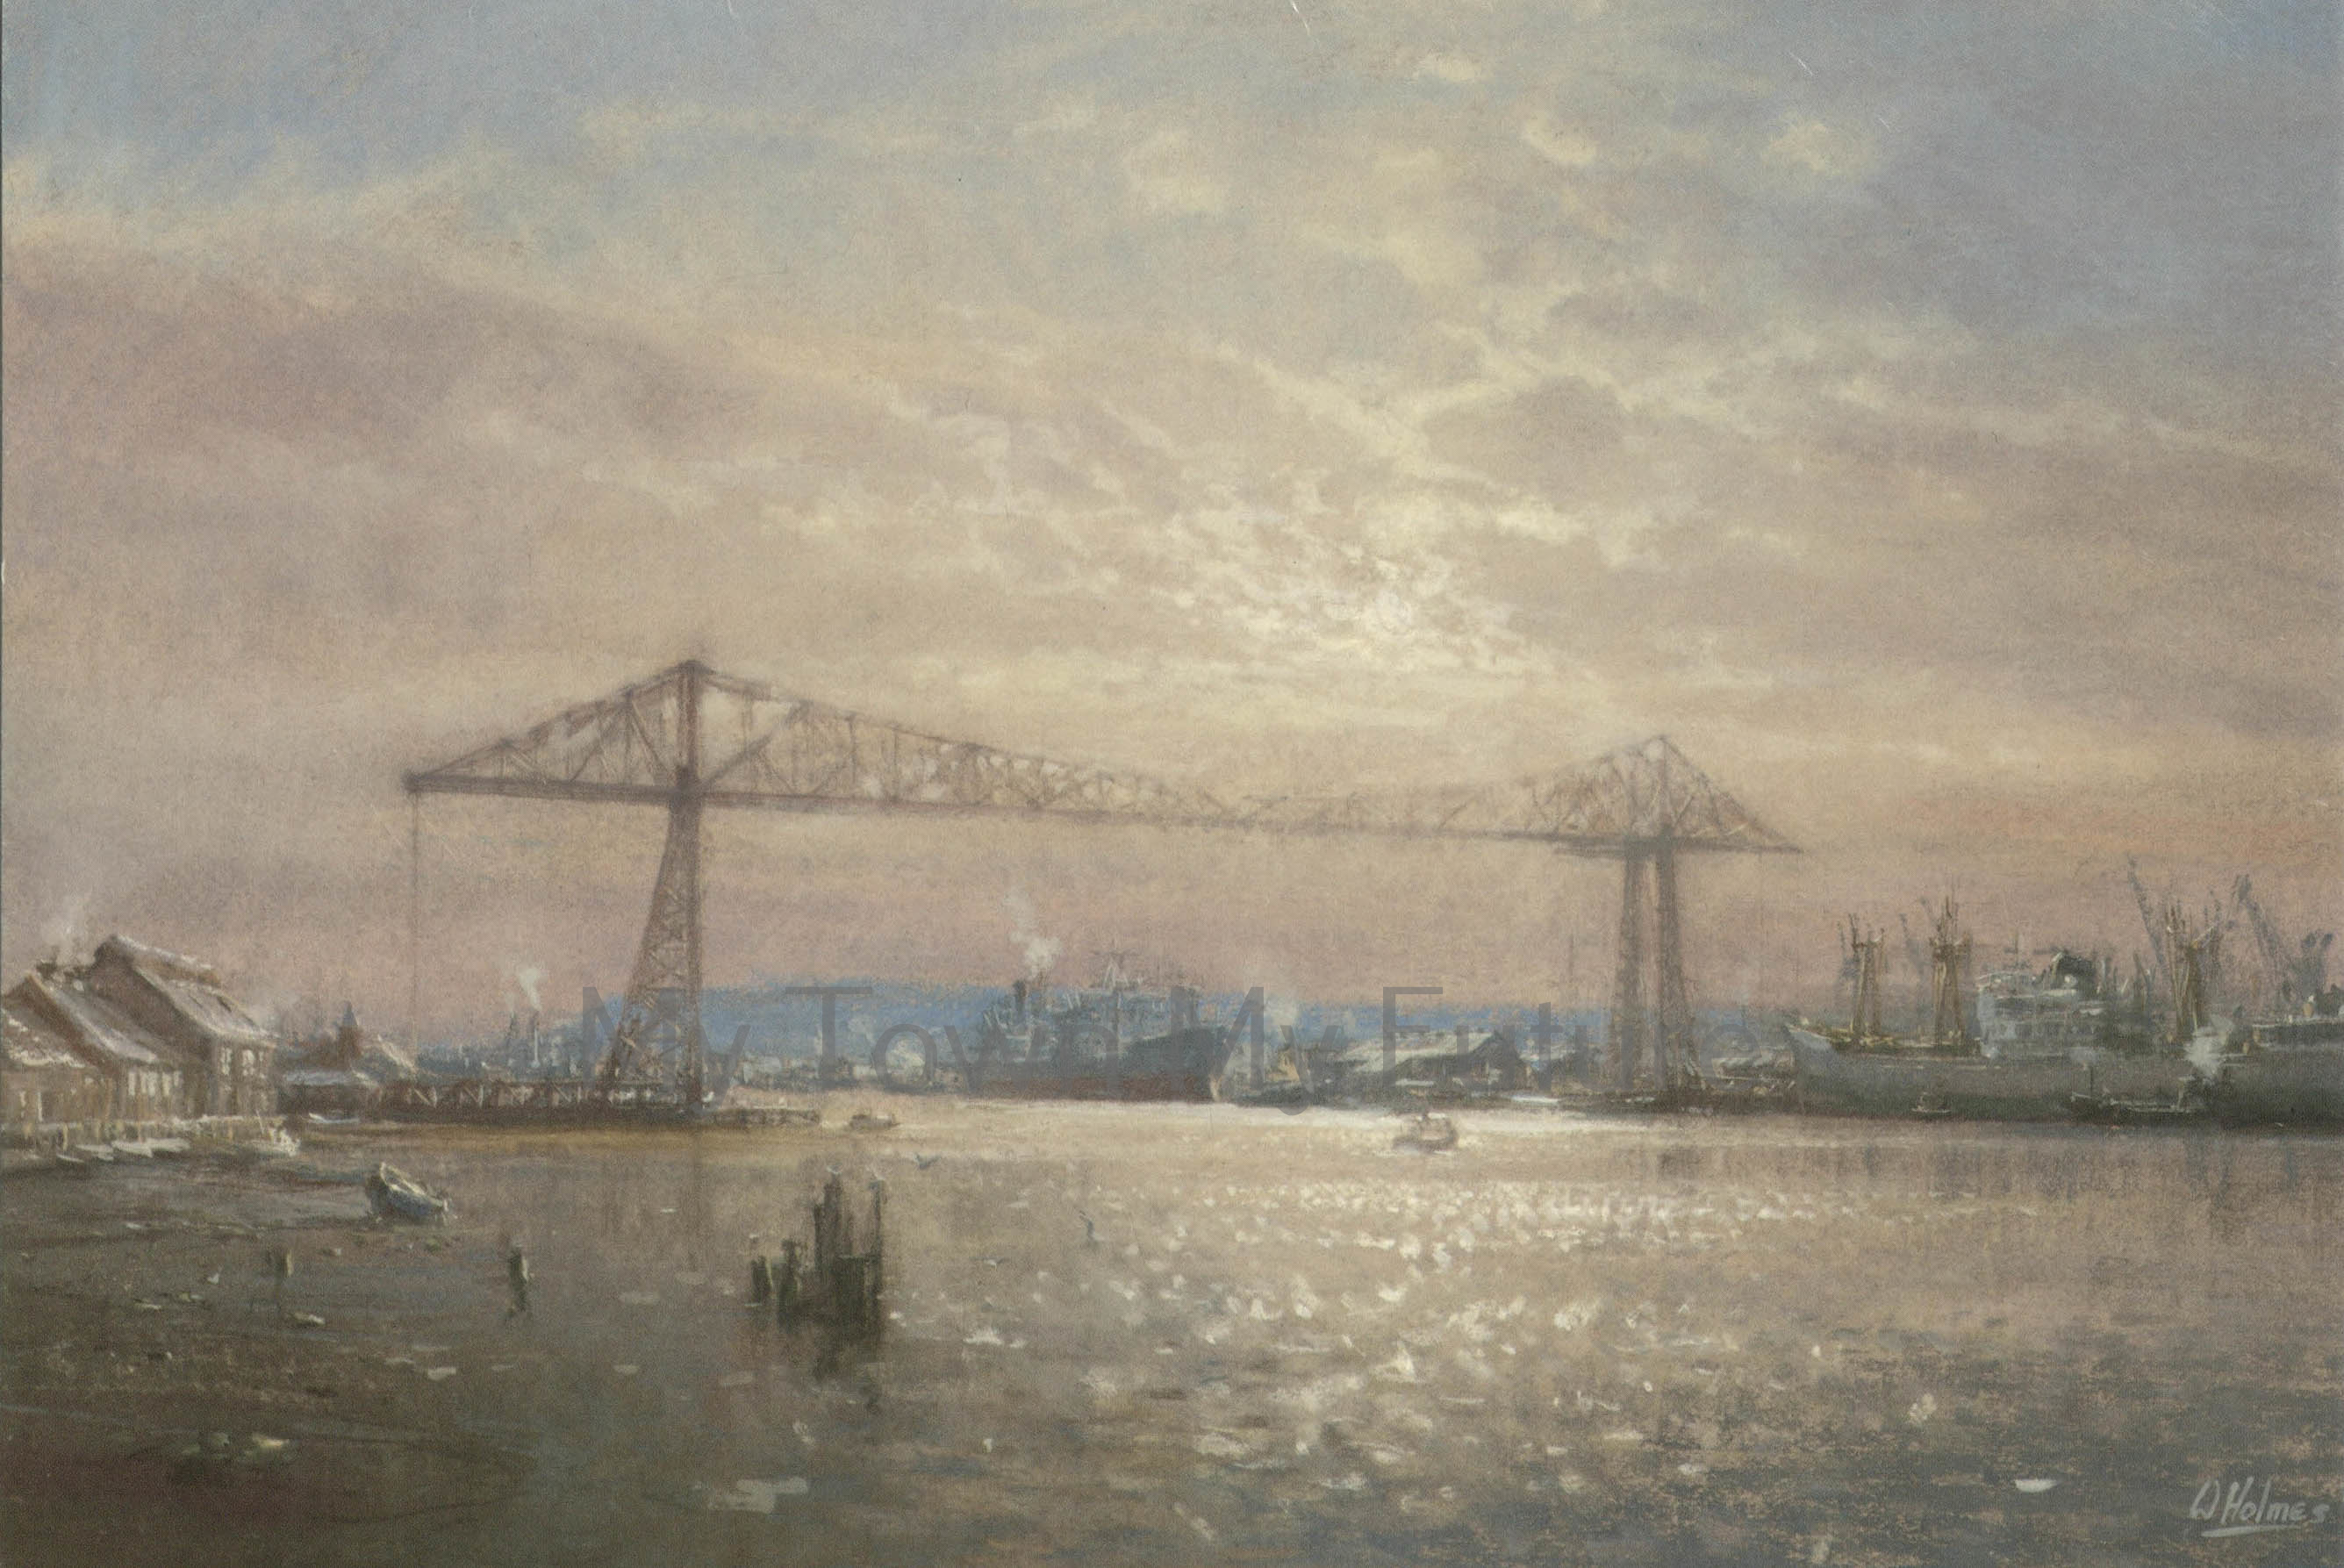 Transporter Bridge - Christmas Card by Walter Holmes, Oakwood Cards Ltd